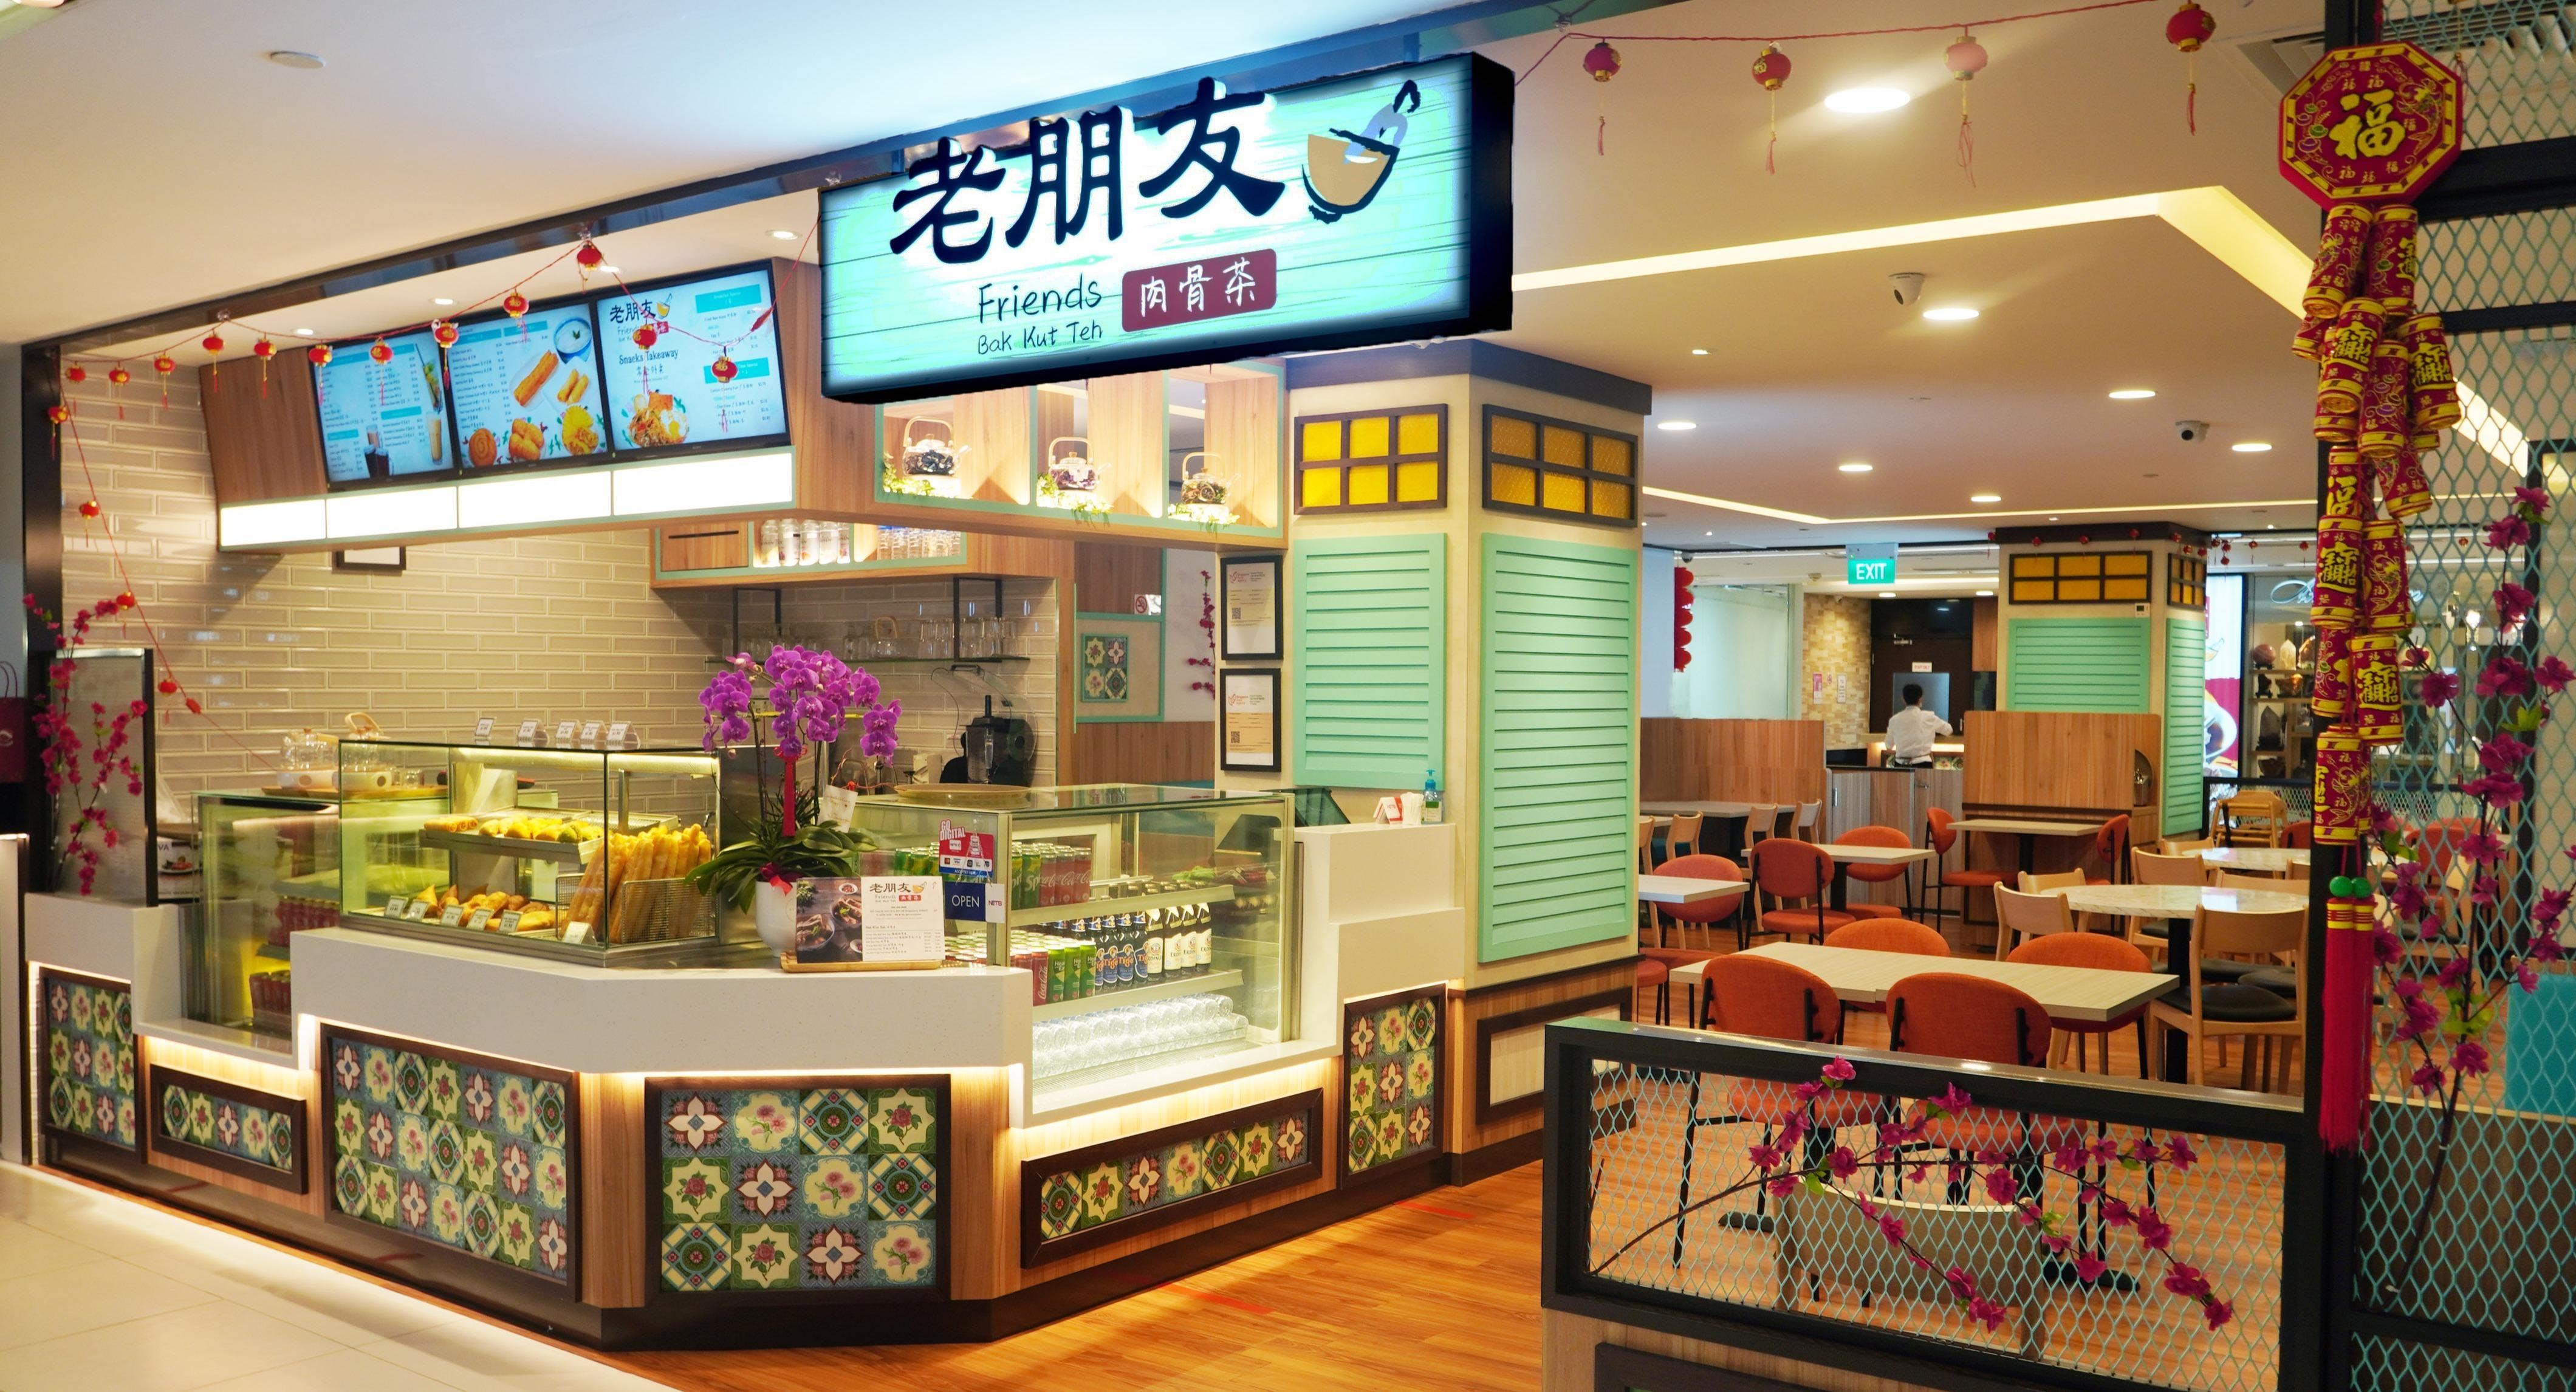 Photo of restaurant Friends Bak Kut Teh in Tanjong Pagar, Singapore